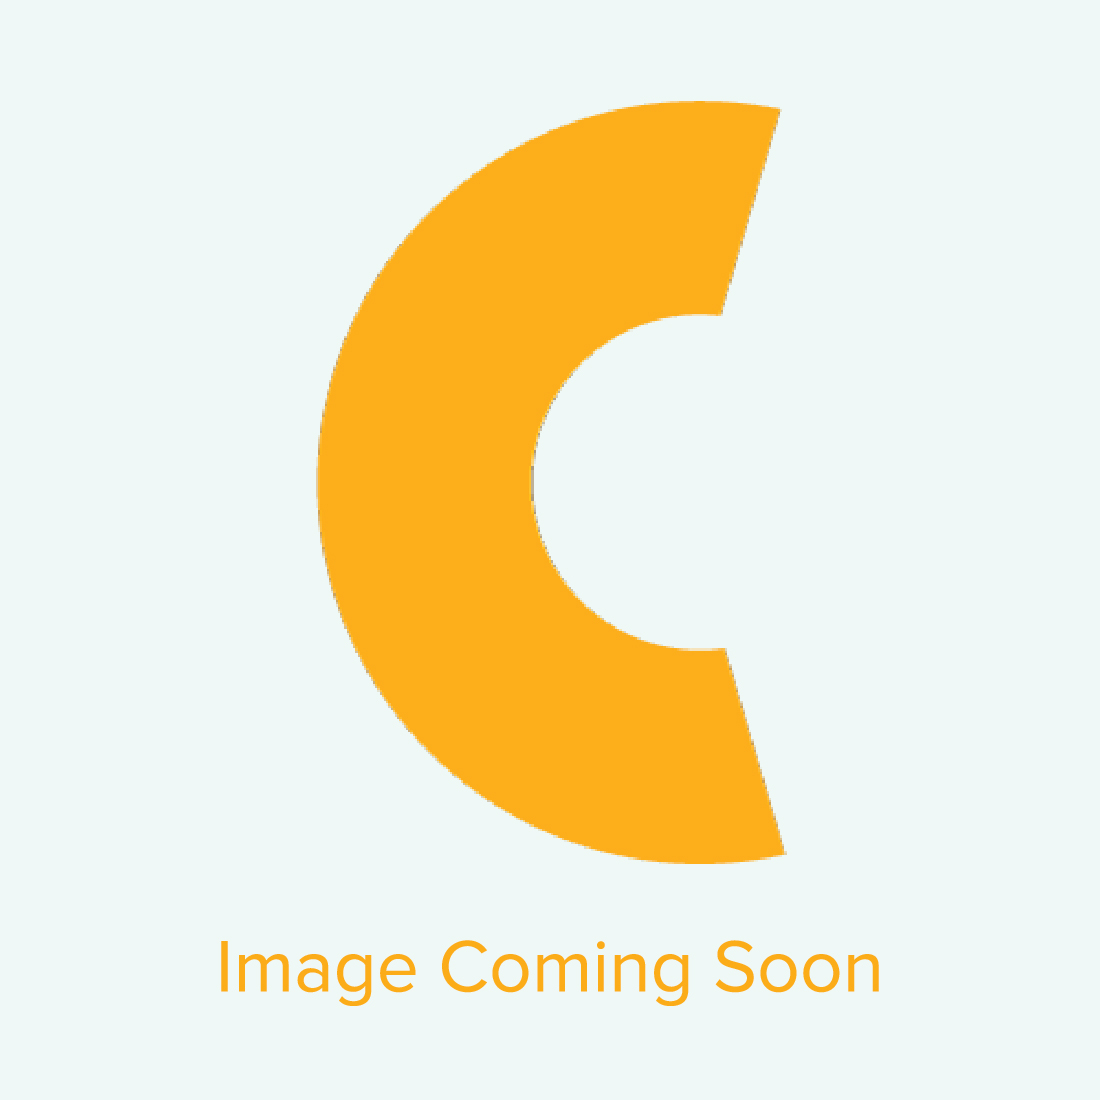 "Black Hardboard Shadow Mount Display Block for ChromaLuxe Metal Photo Prints - 9"" x 12"" - OVERSTOCK"